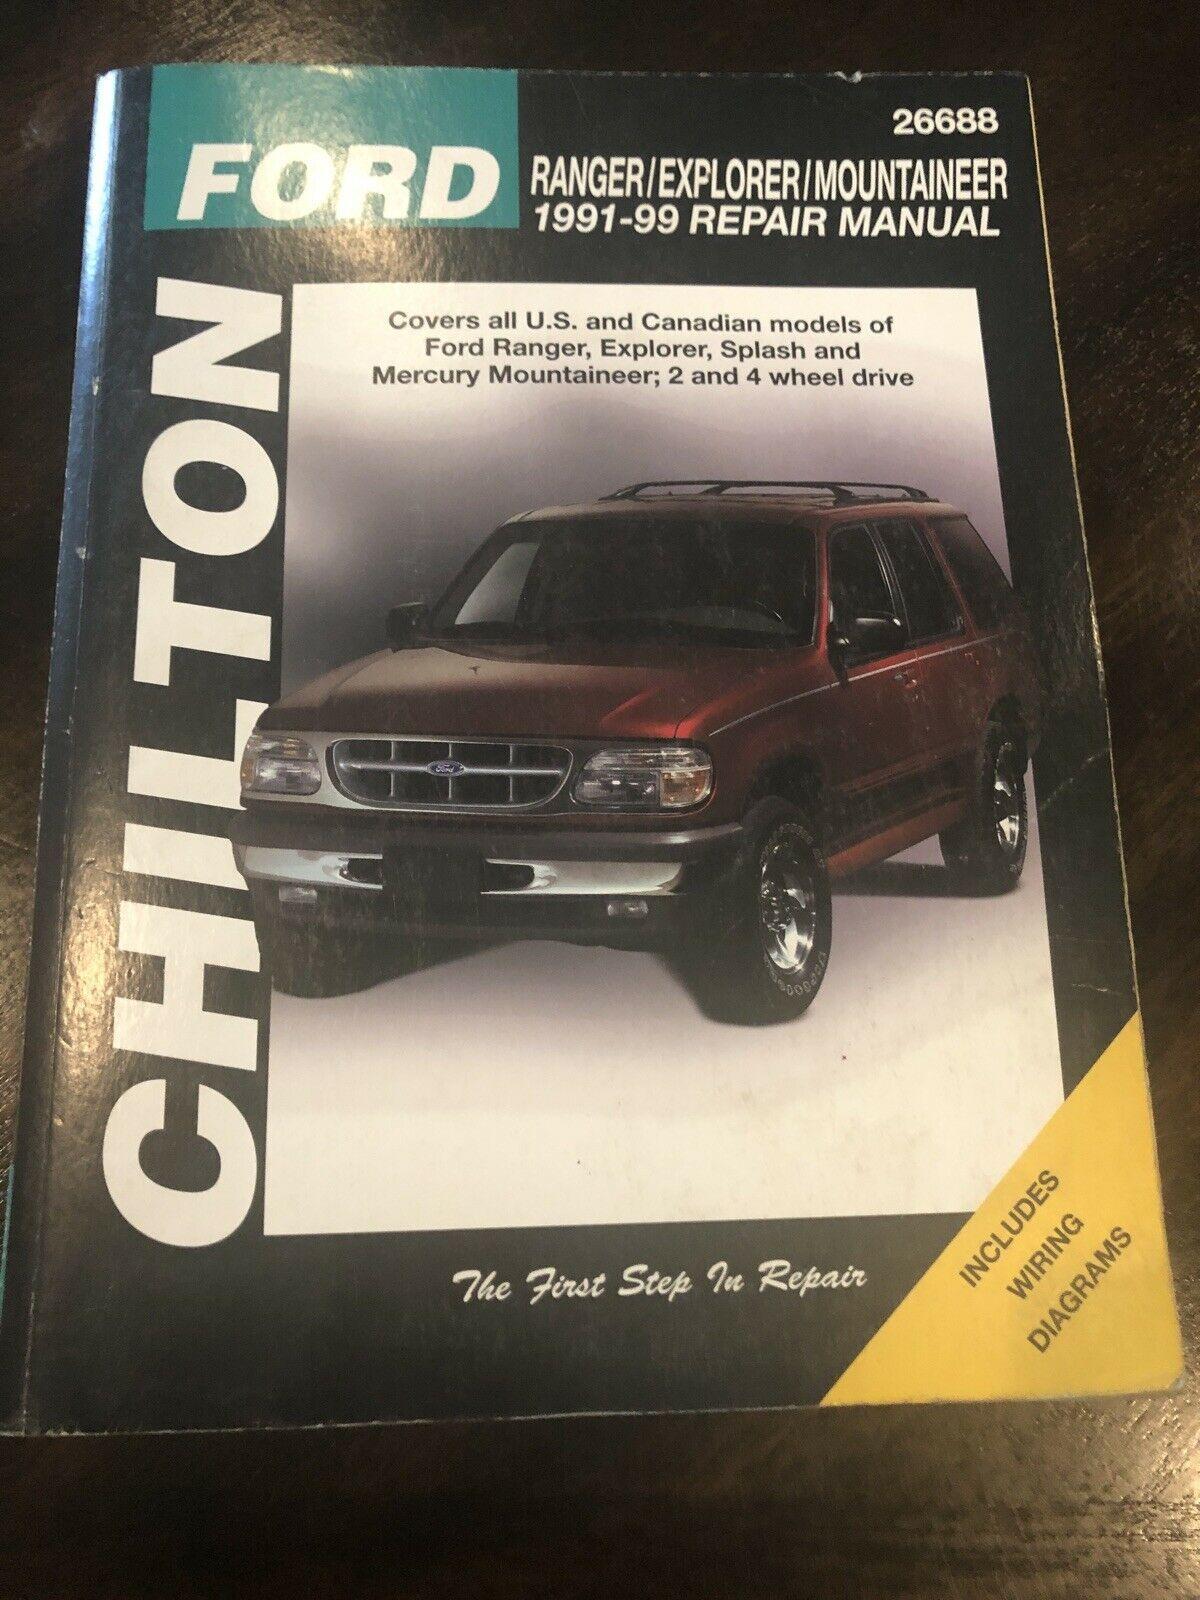 Chilton Repair Manual 1991-1999 Ford Ranger and 36 similar items | Wiring Diagram For 1999 Ford Ranger Pick Up |  | Bonanza